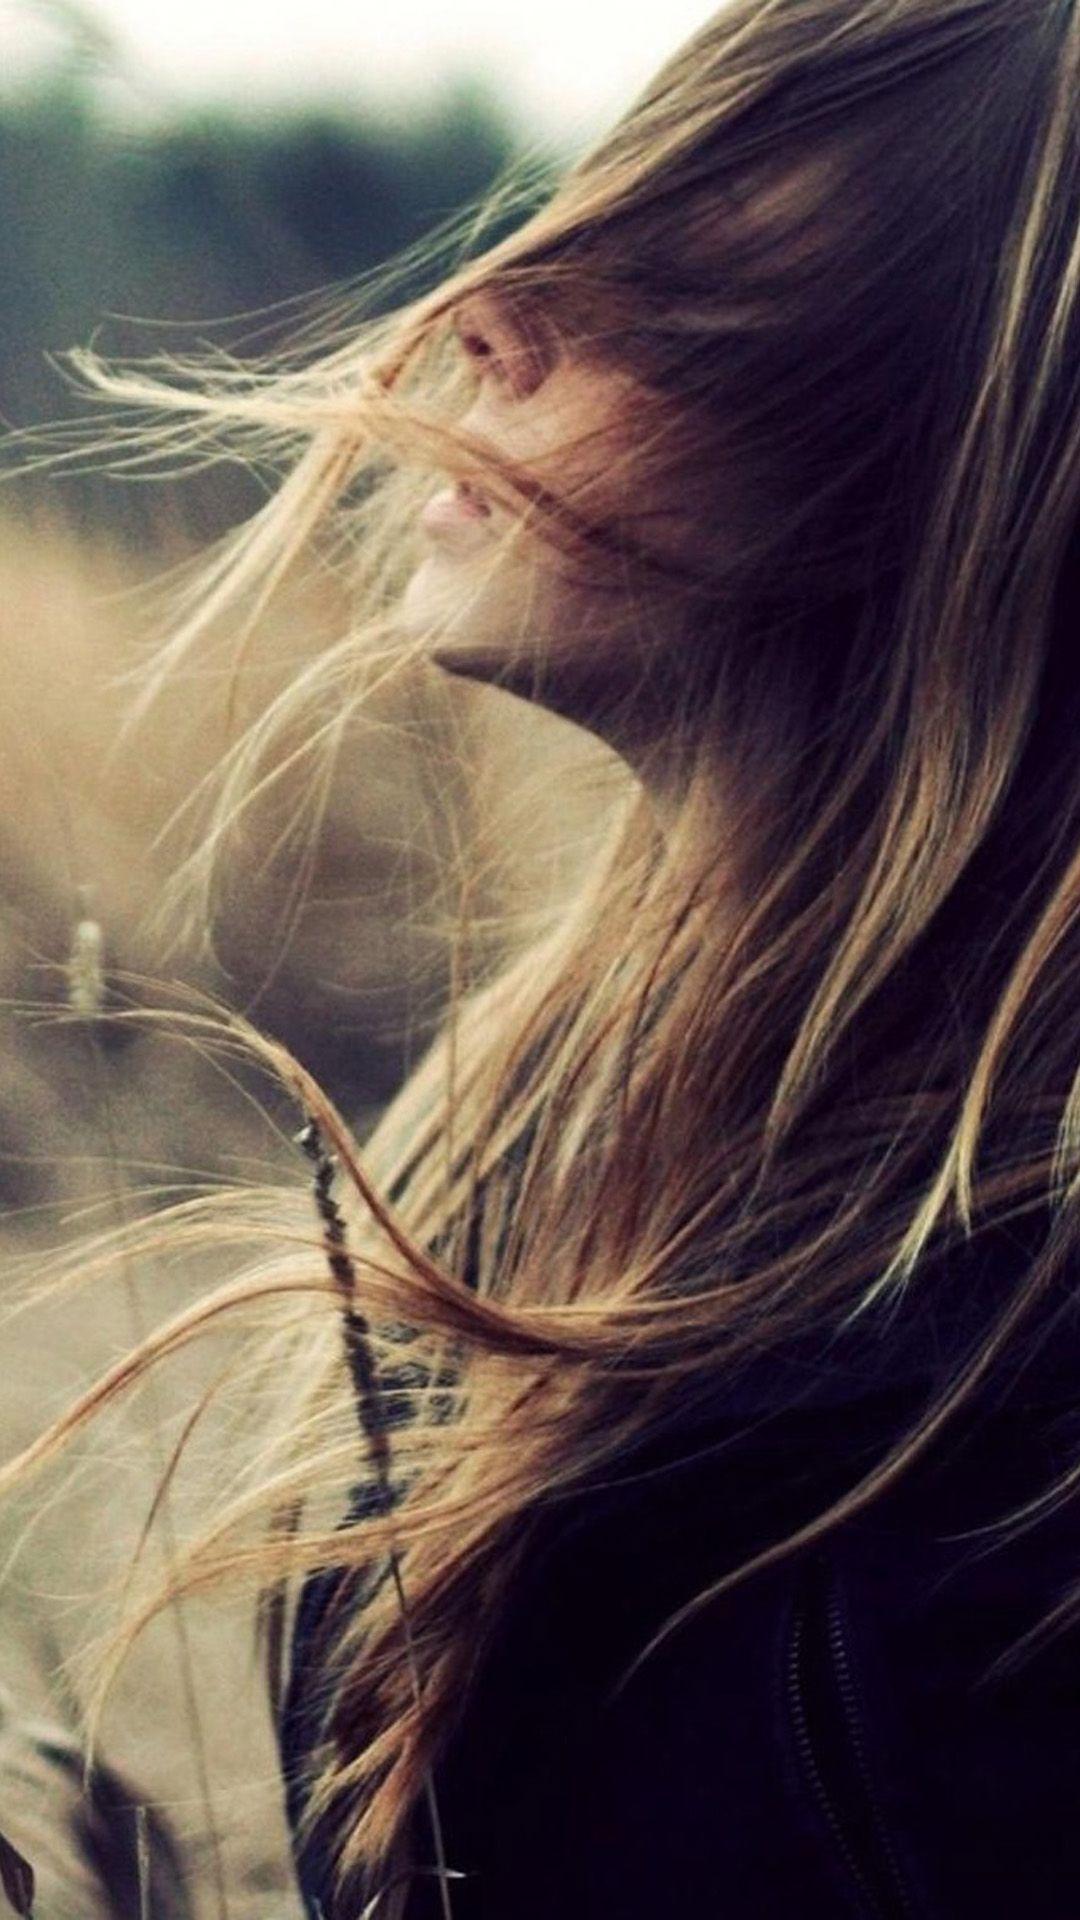 Beautiful Girl Face Flying Hair Iphone 6 Wallpaper Download Iphone Wallpapers Ipad Wallpapers One Stop Down Hair In The Wind Beautiful Girl Face Nature Girl